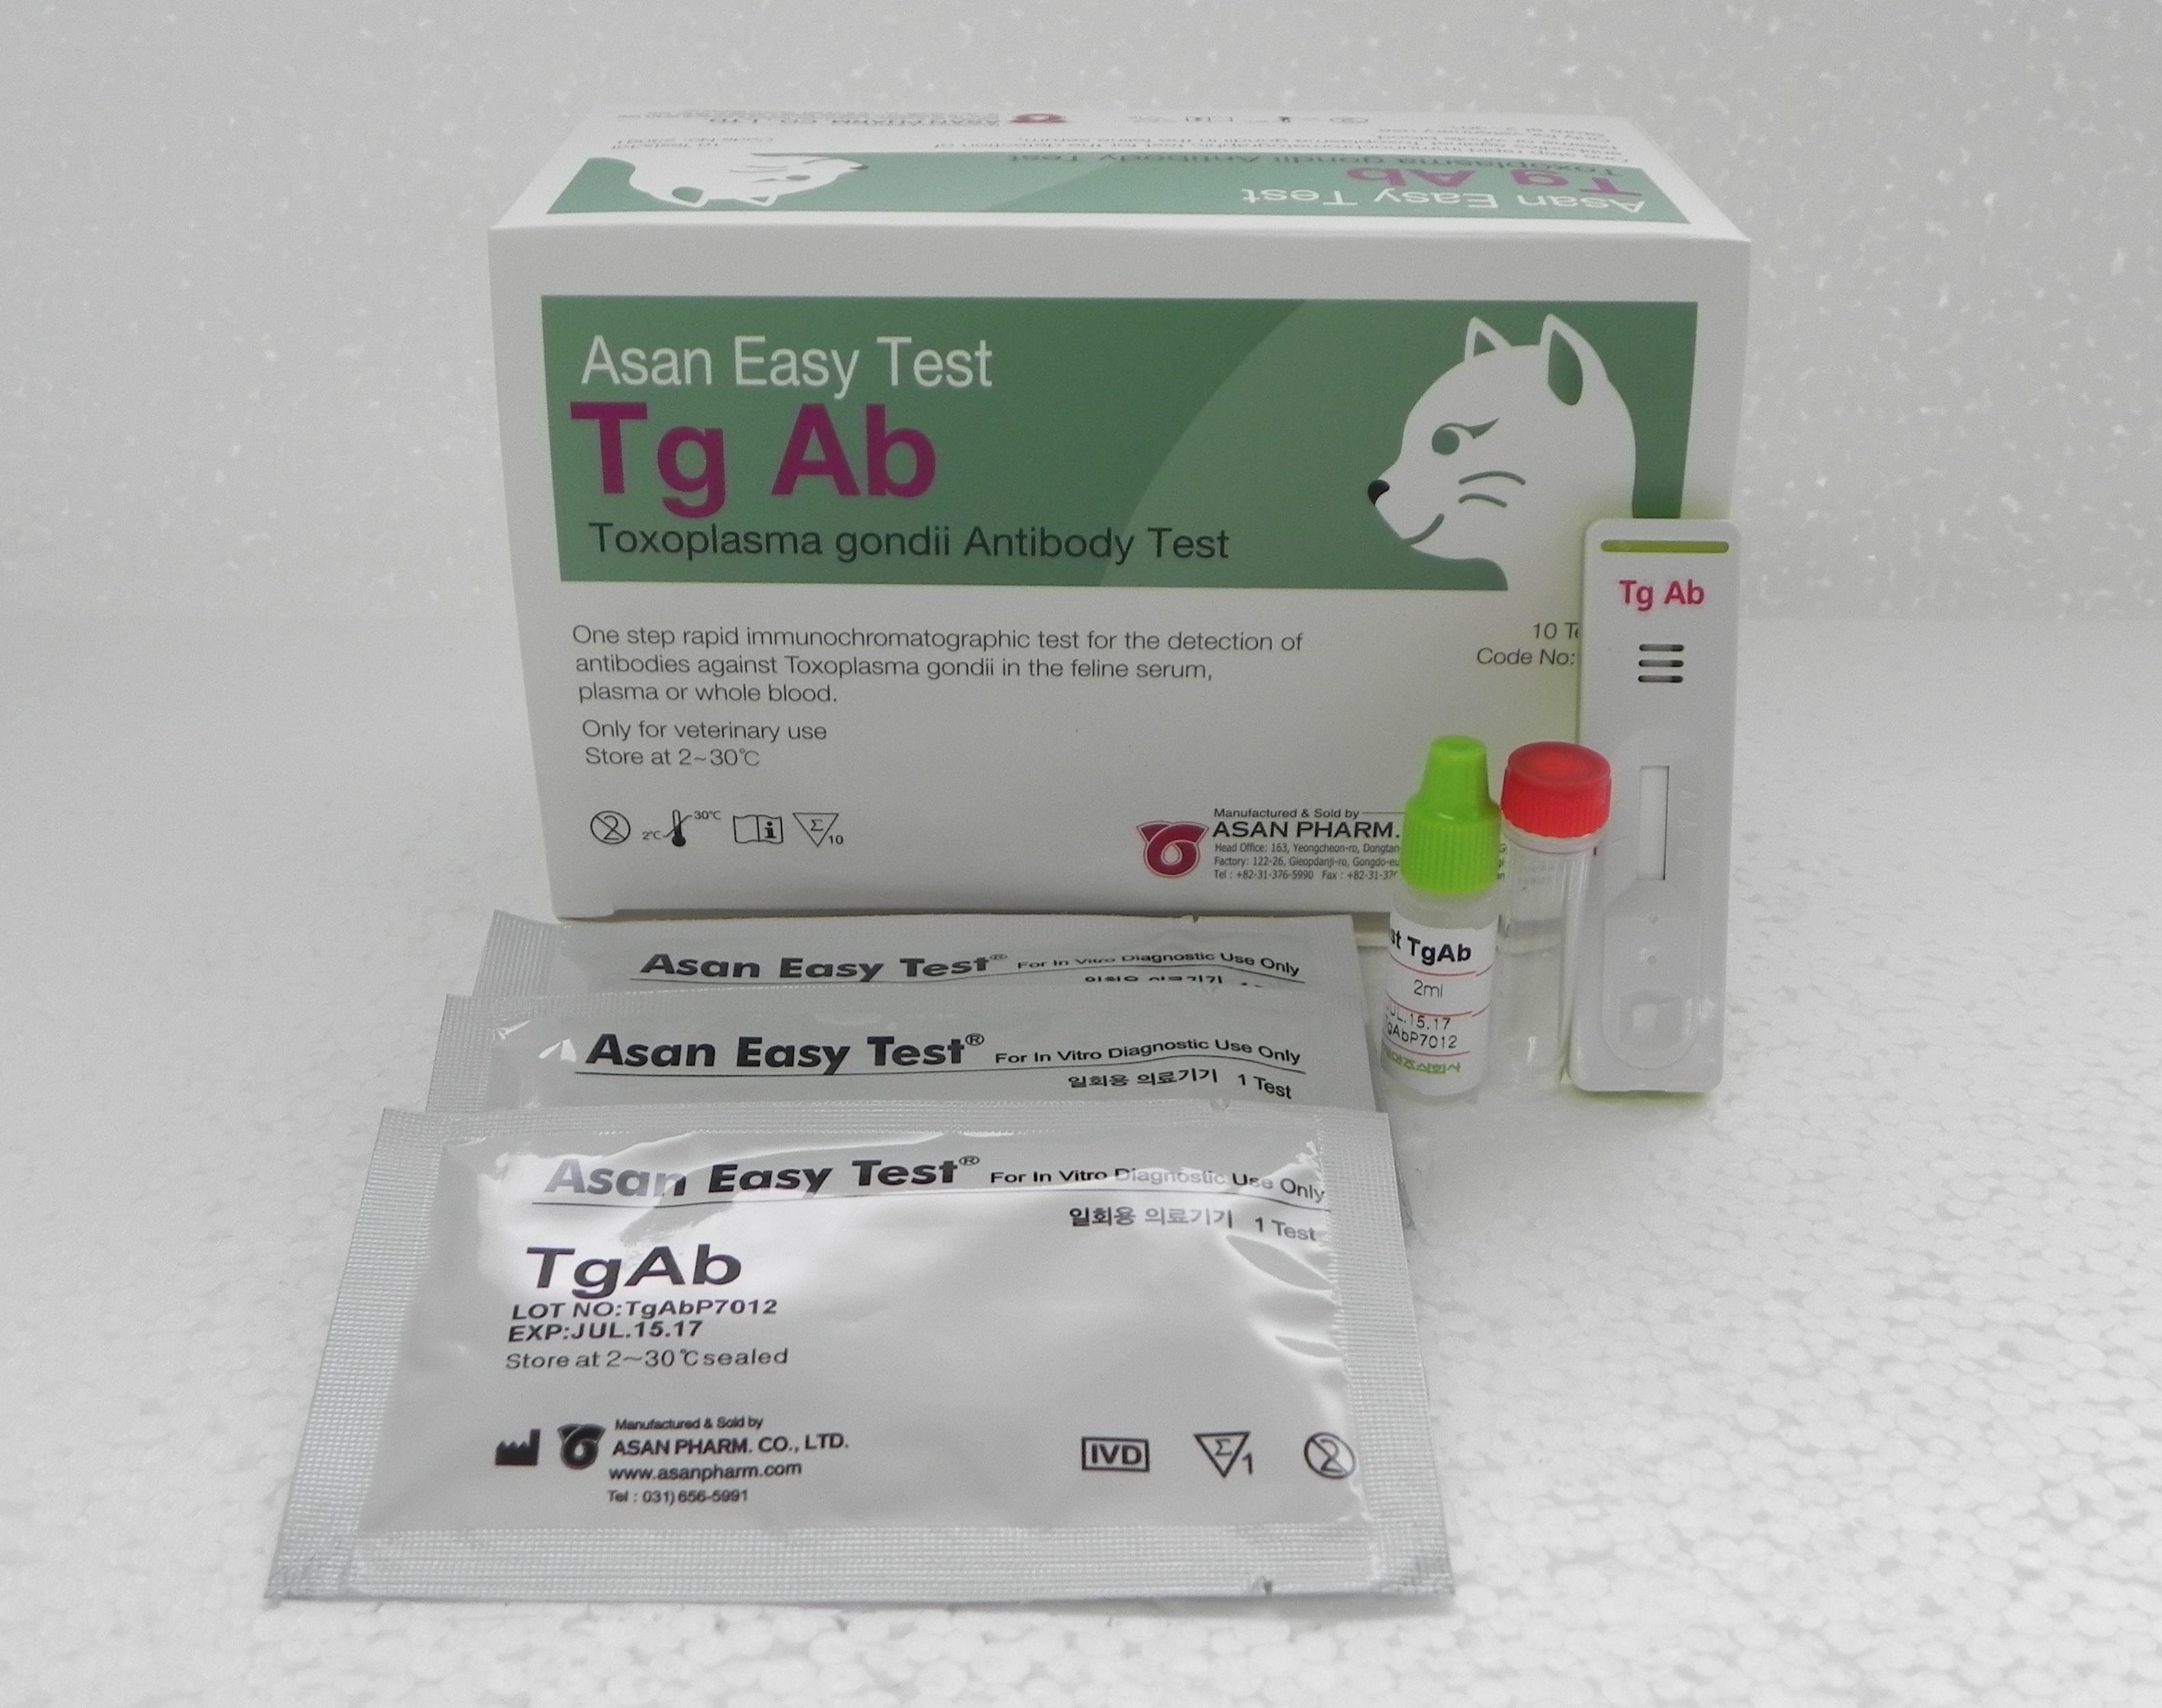 Asan Easy Test TgAb